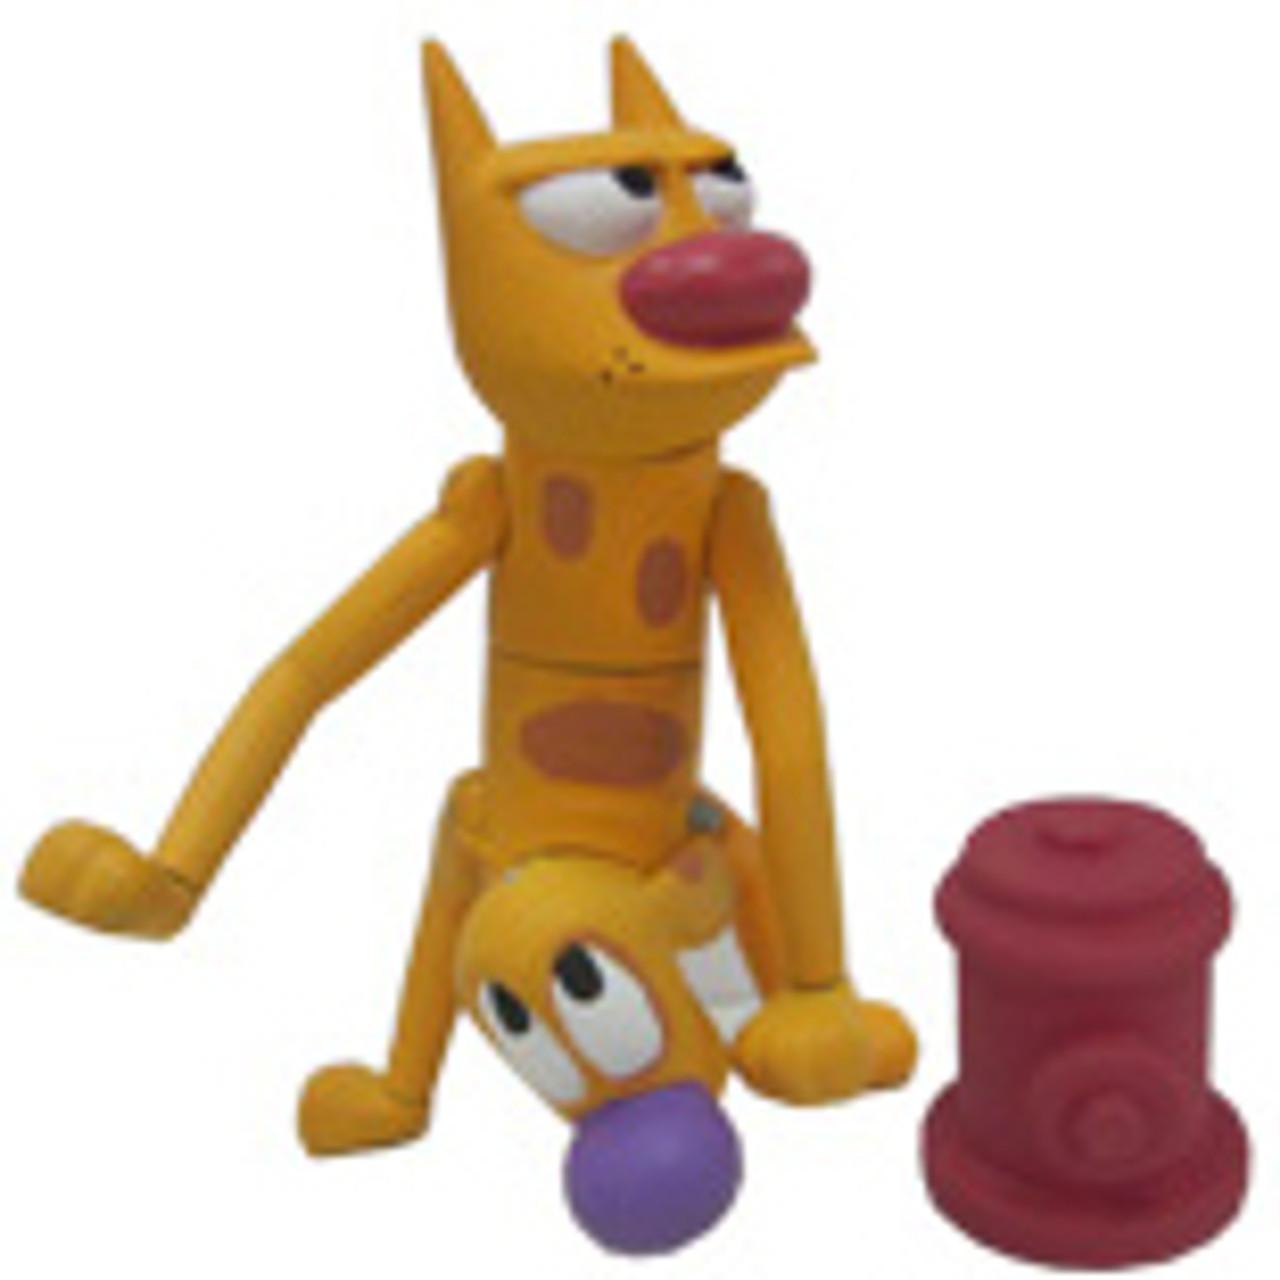 CatDog 3-Inch Figure